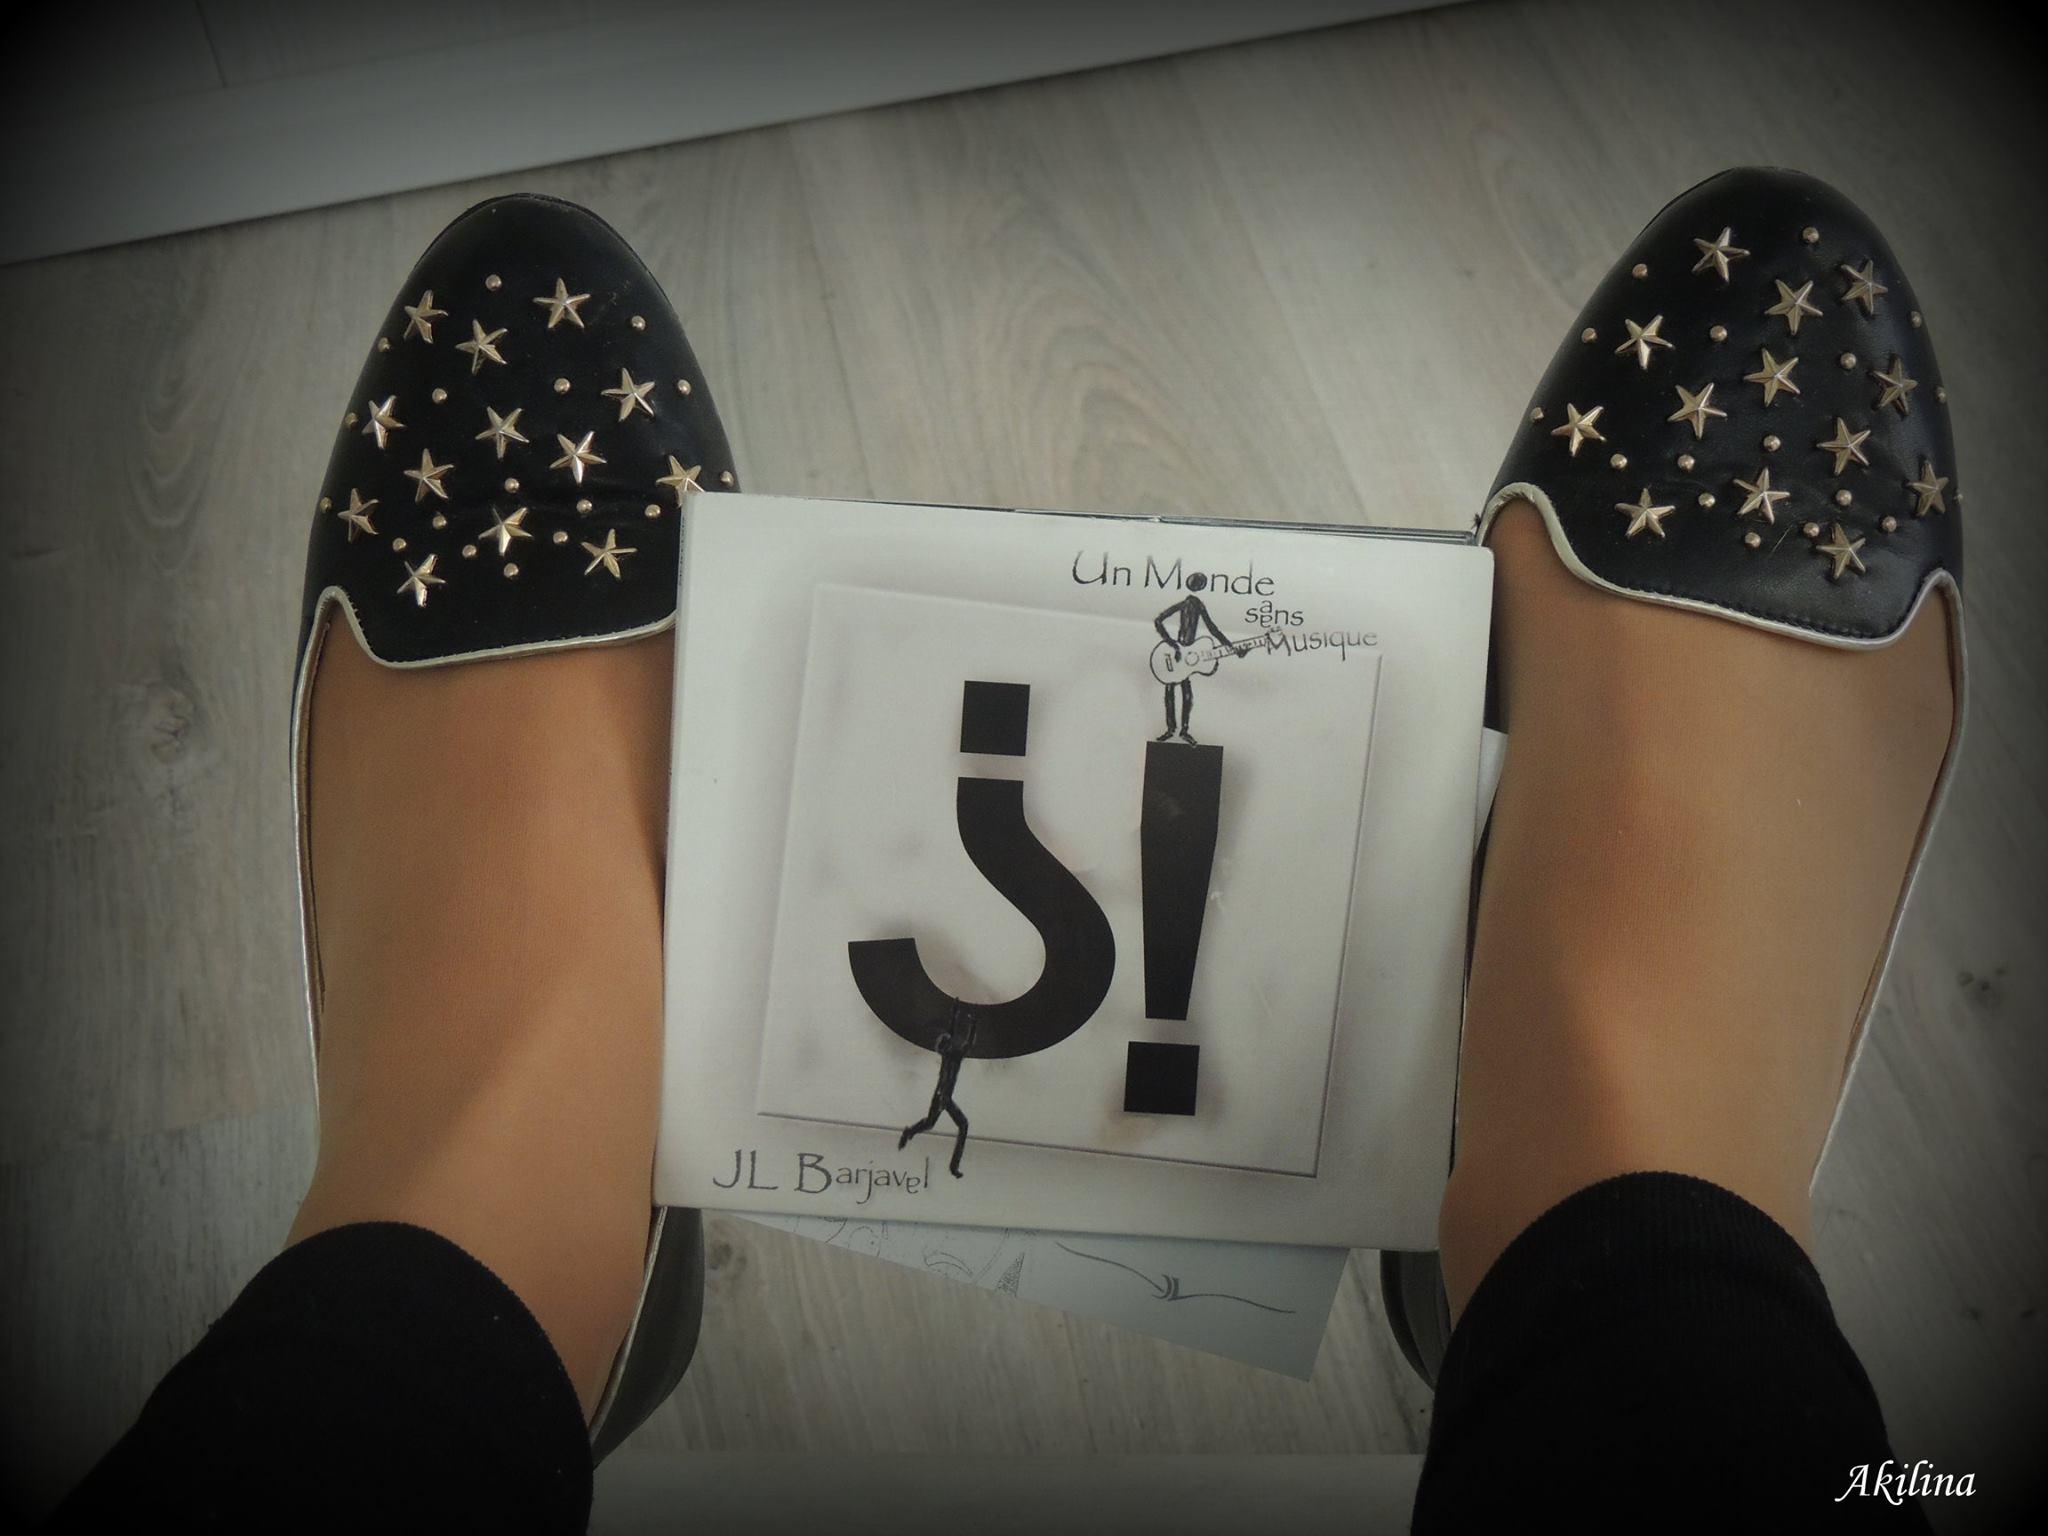 JL Album by Sylvia 073.jpg